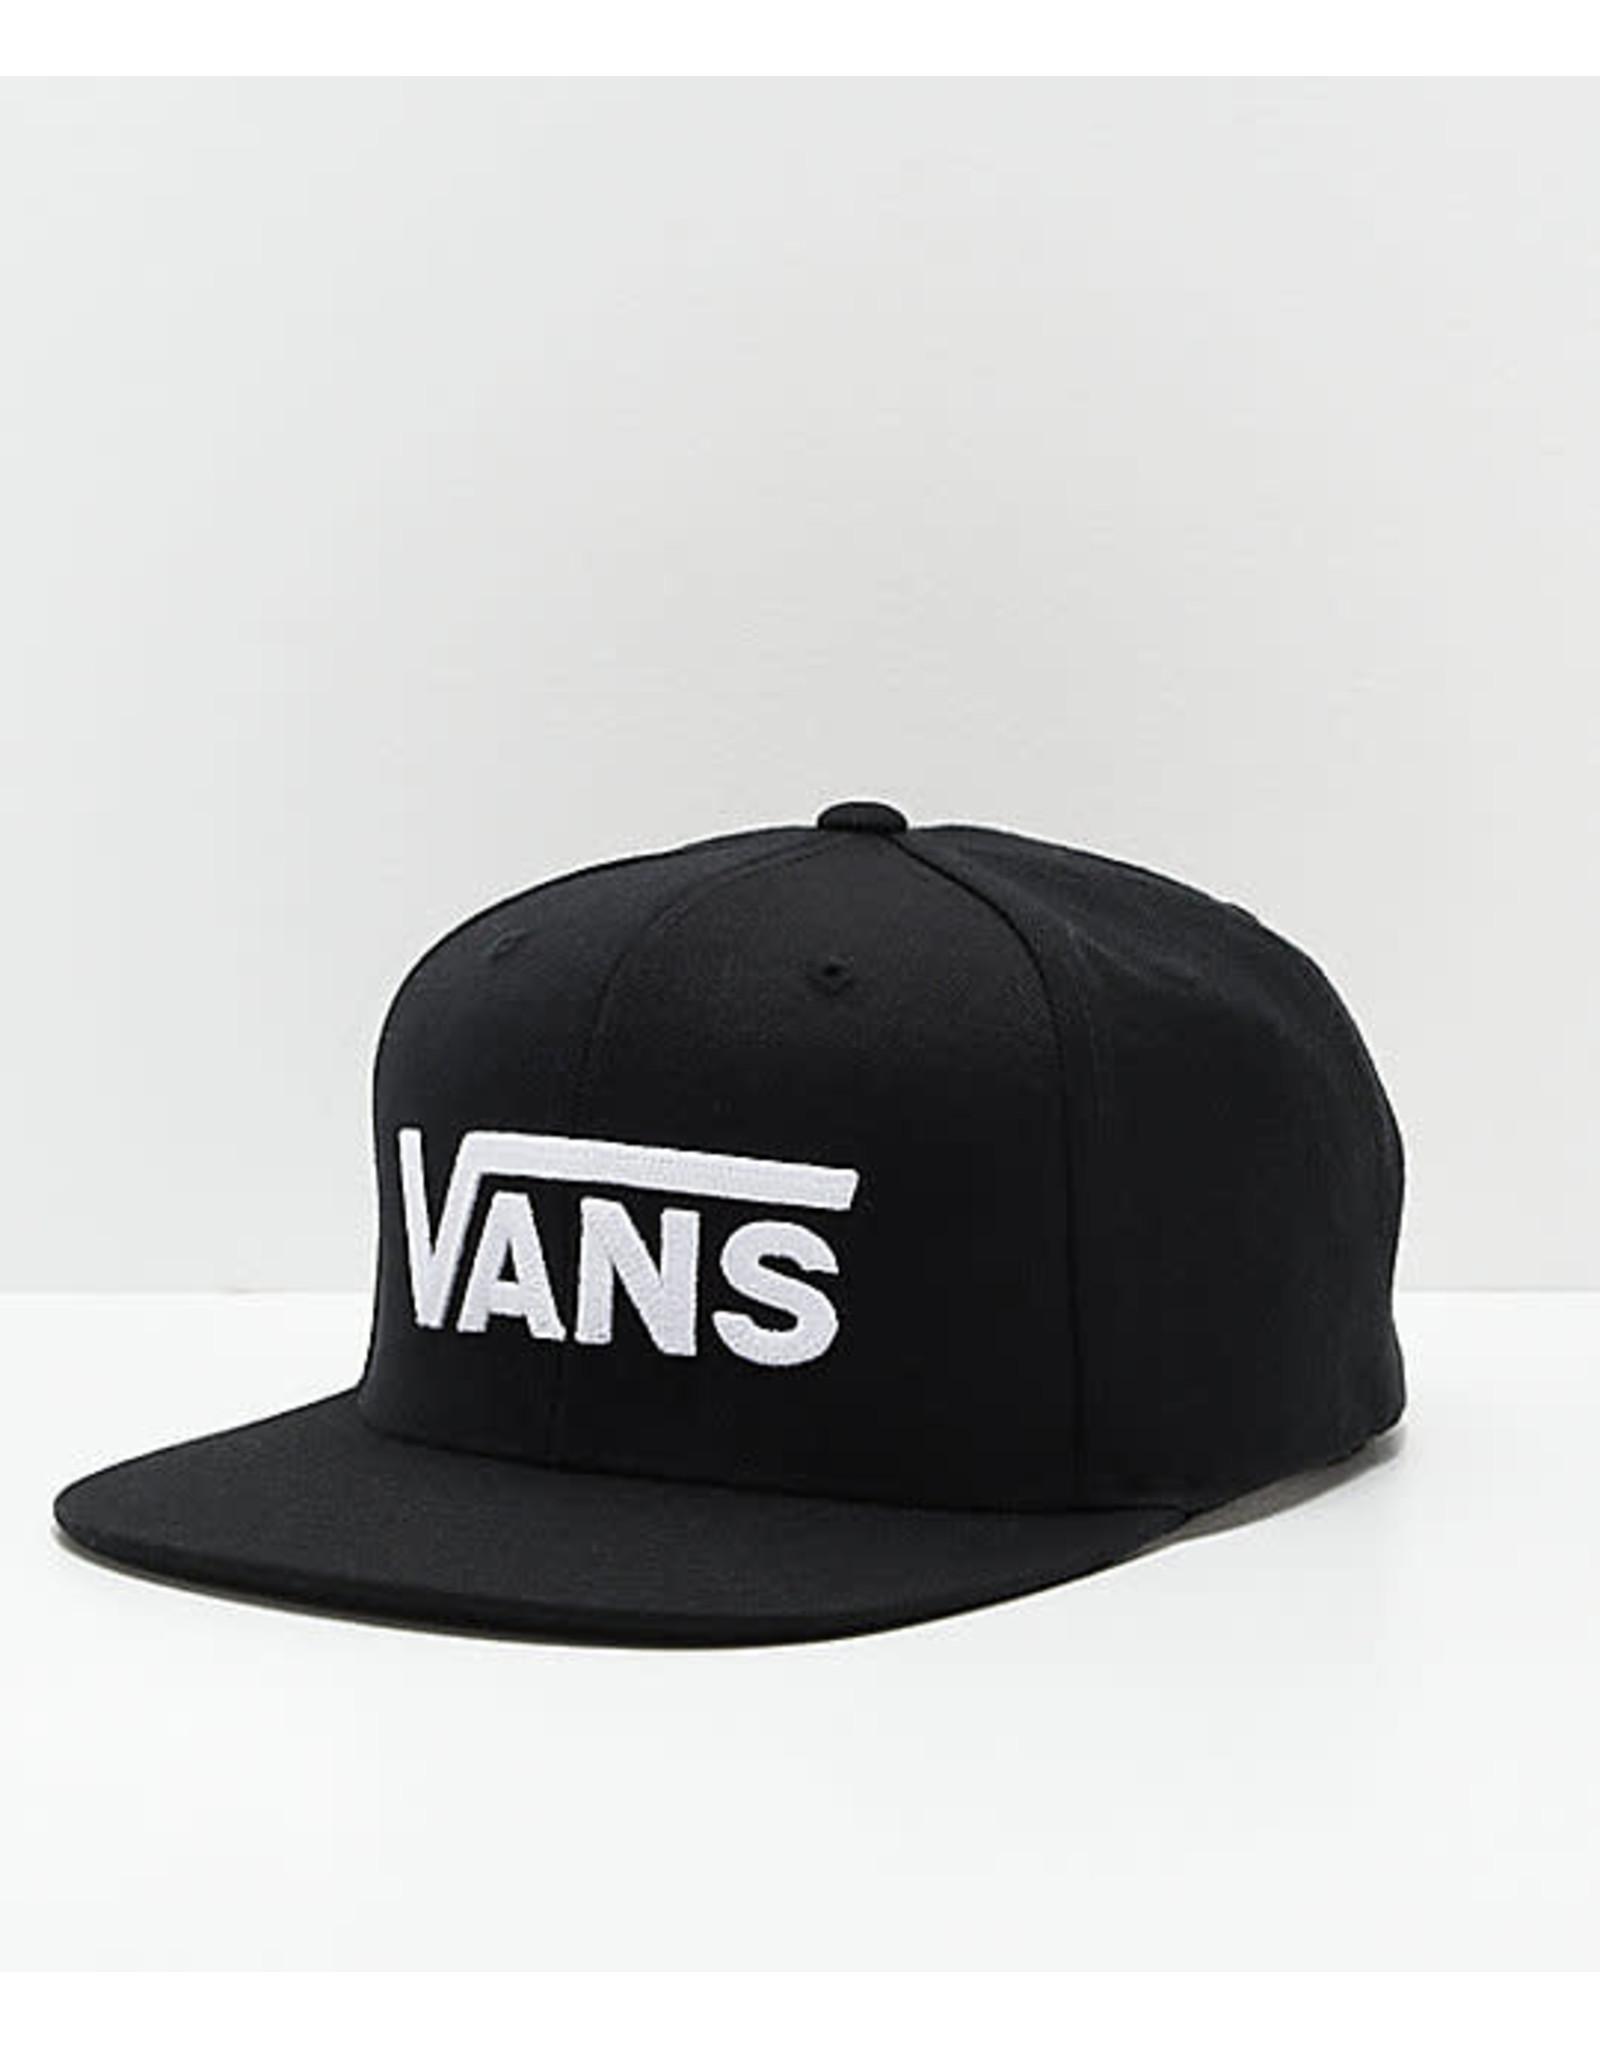 vans Vans - Casquettes Drop V II Snapback Black/White